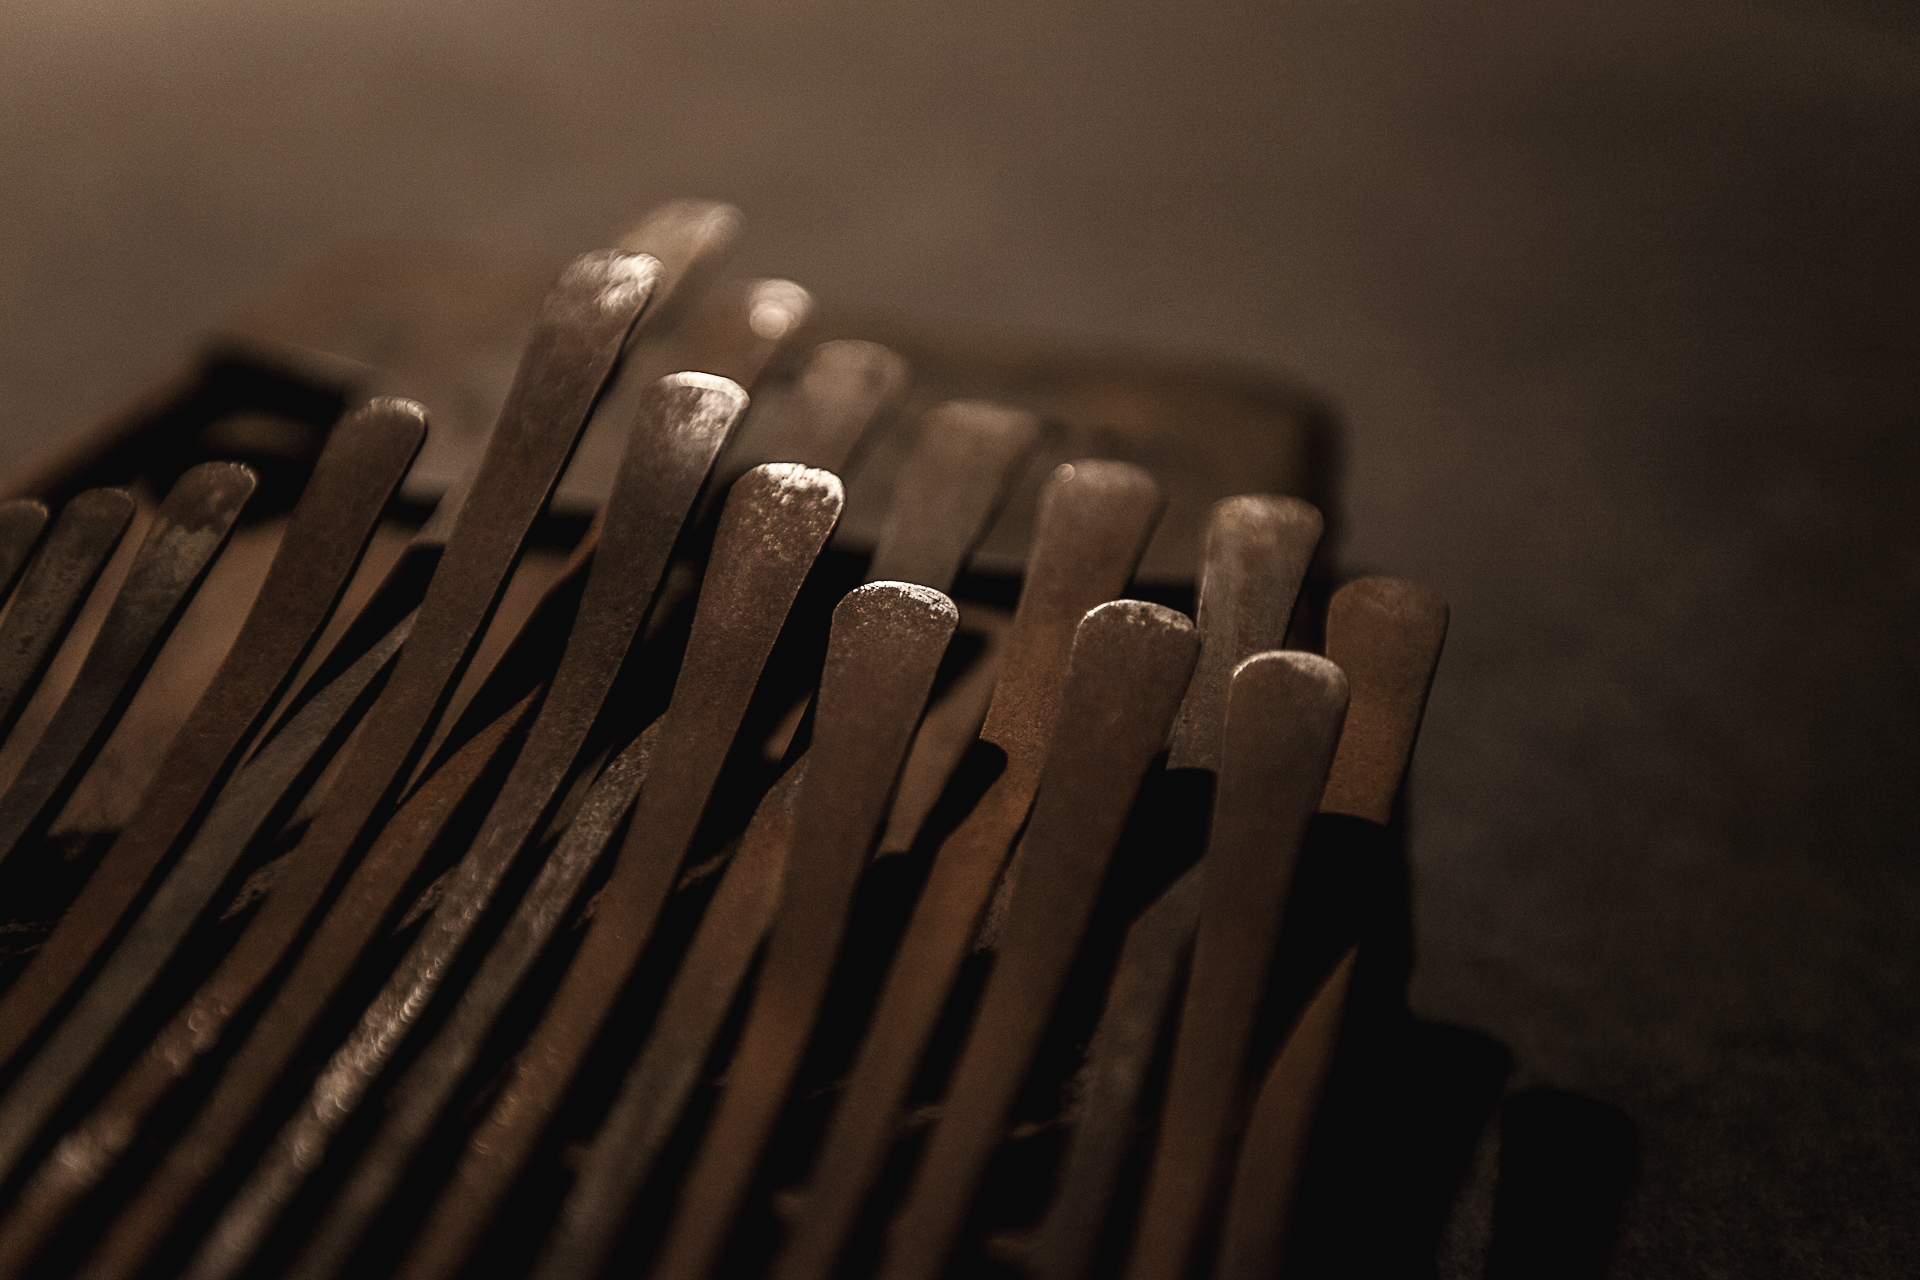 Fotografia-Photography-Centro-Benenzon-CBP-Photo-Series-Instrumentos-Musicais-Musical-Instruments-Tradicional-Traditional-bonjourmolotov-Andre-Gigante-02